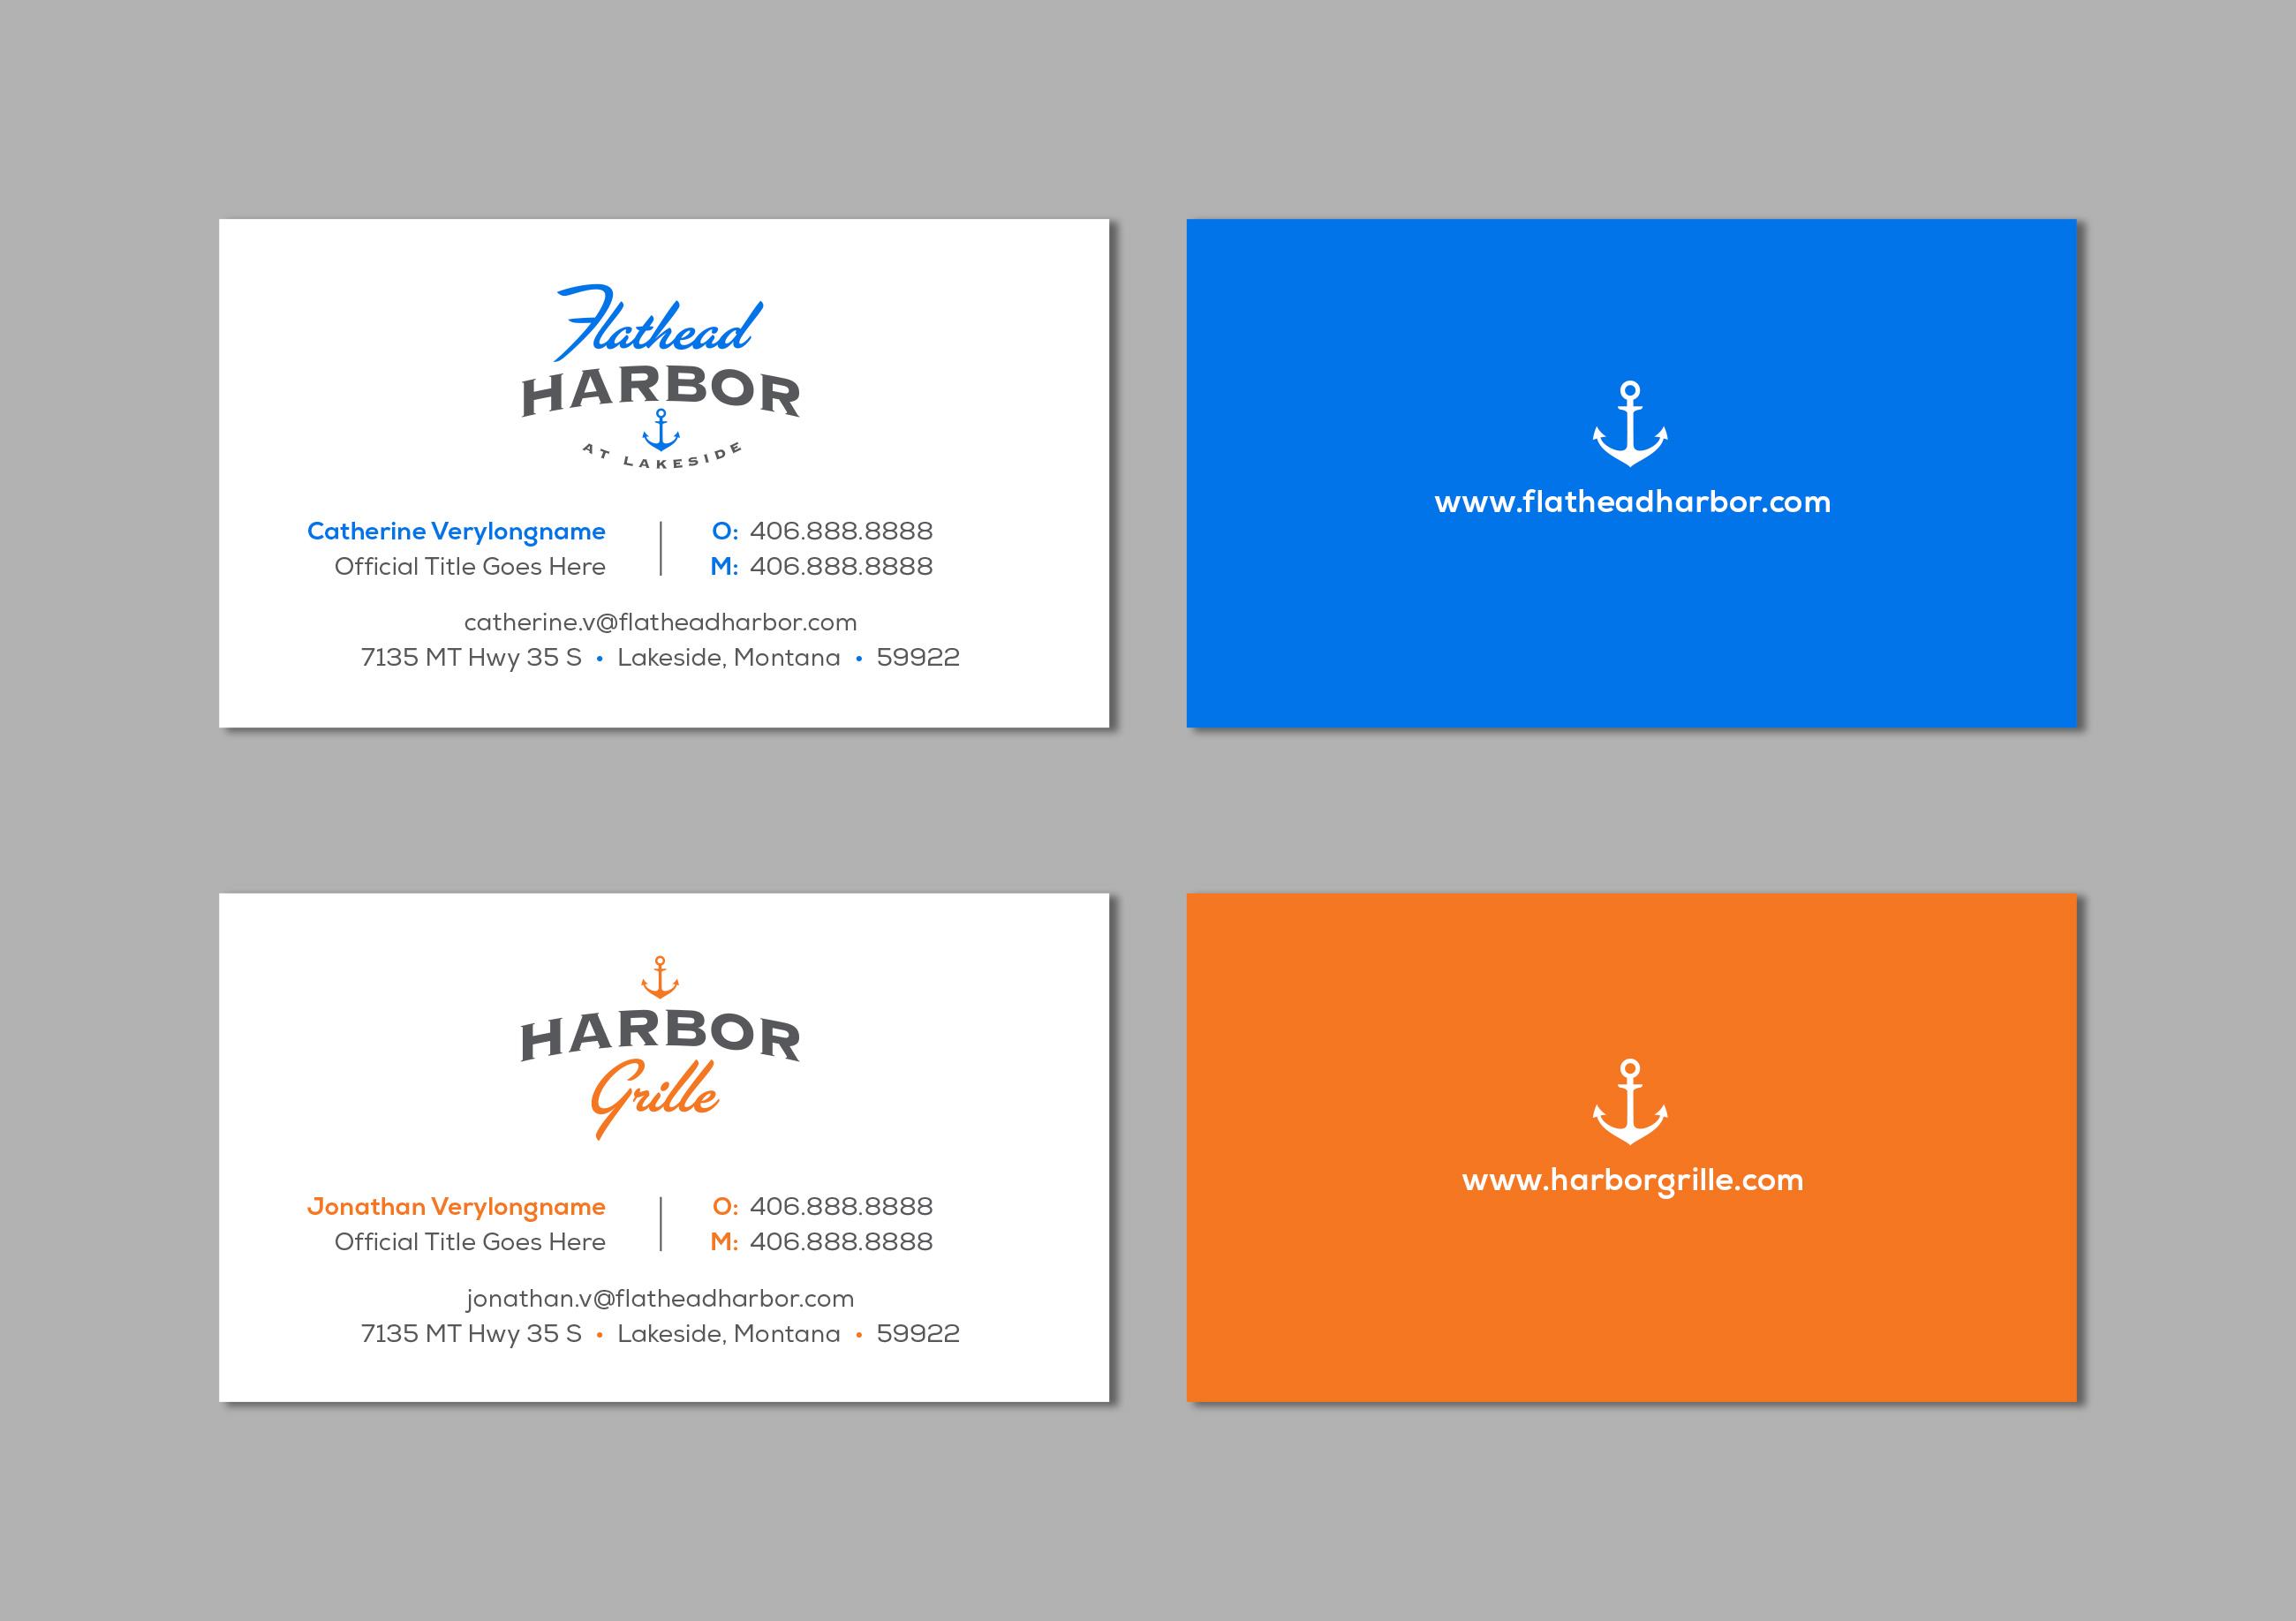 Flathead-Harbor-HG-business-cards-2600x1836px